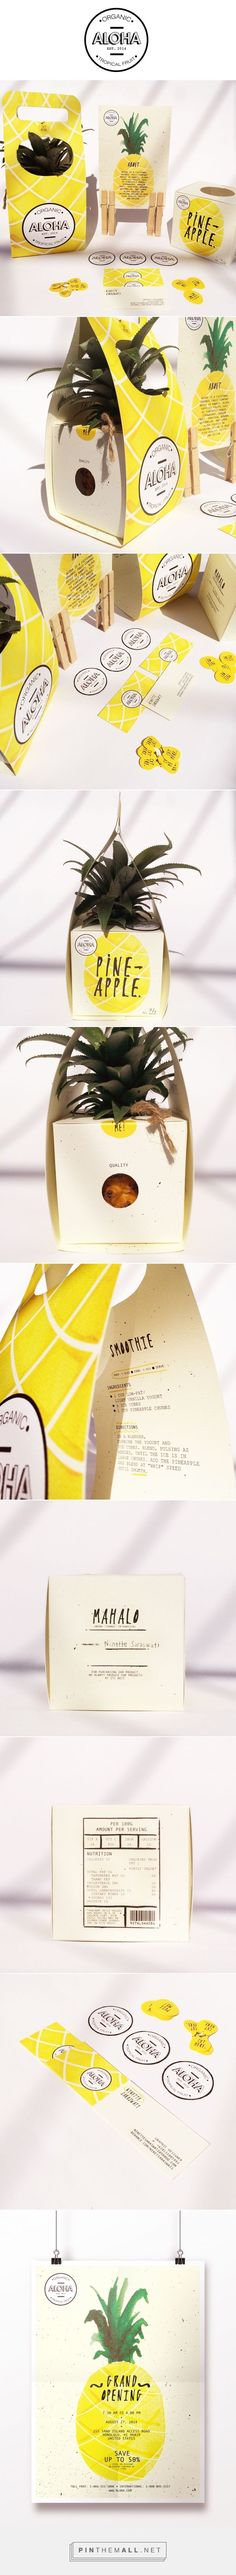 ALOHA Branding and Packaging by Ninette Saraswati